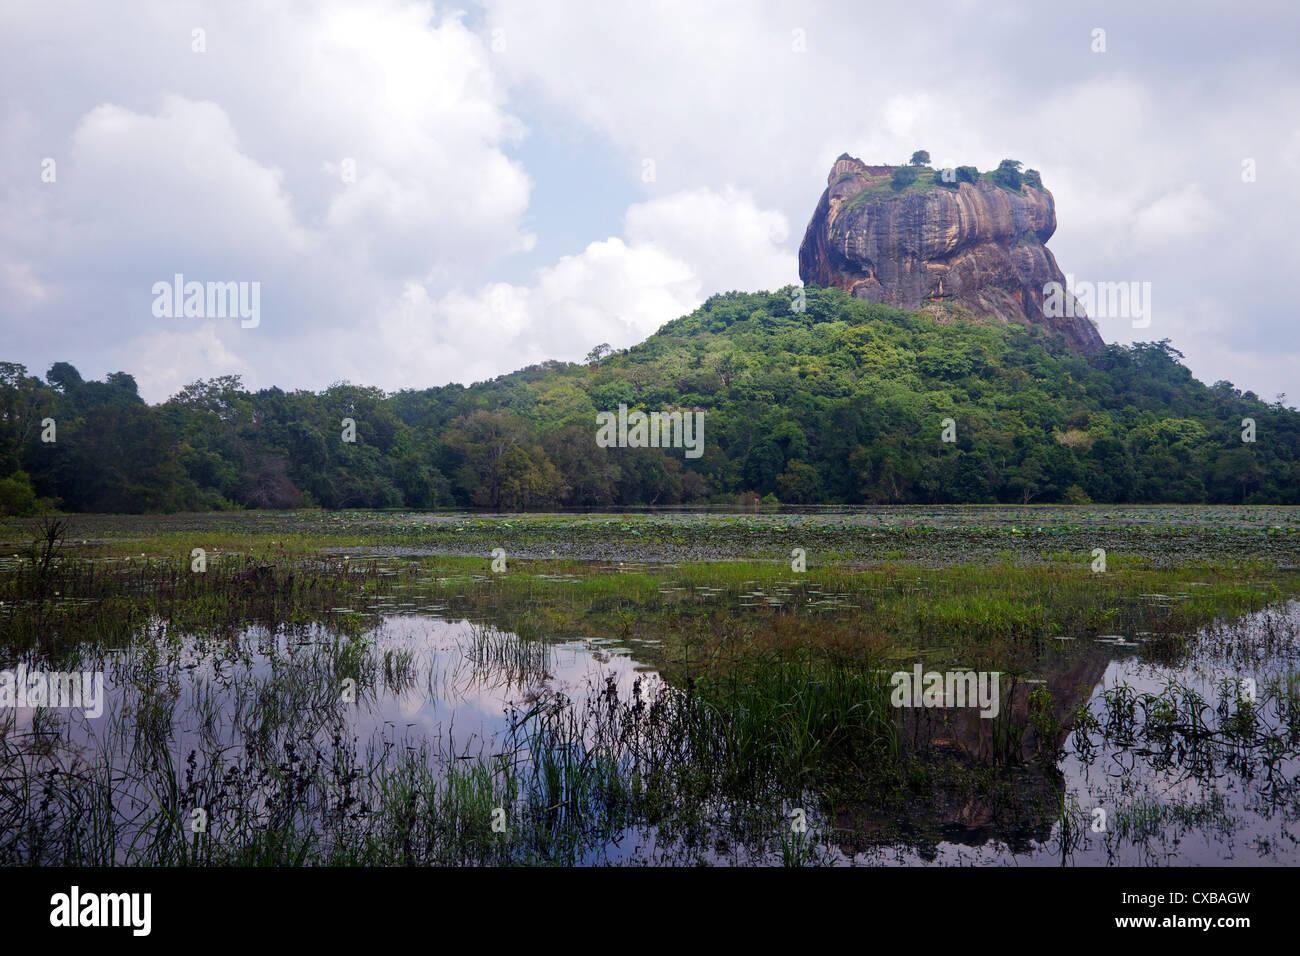 Lion Rock Fortress, Sigiriya, UNESCO World Heritage Site, Sri Lanka, Asia - Stock Image